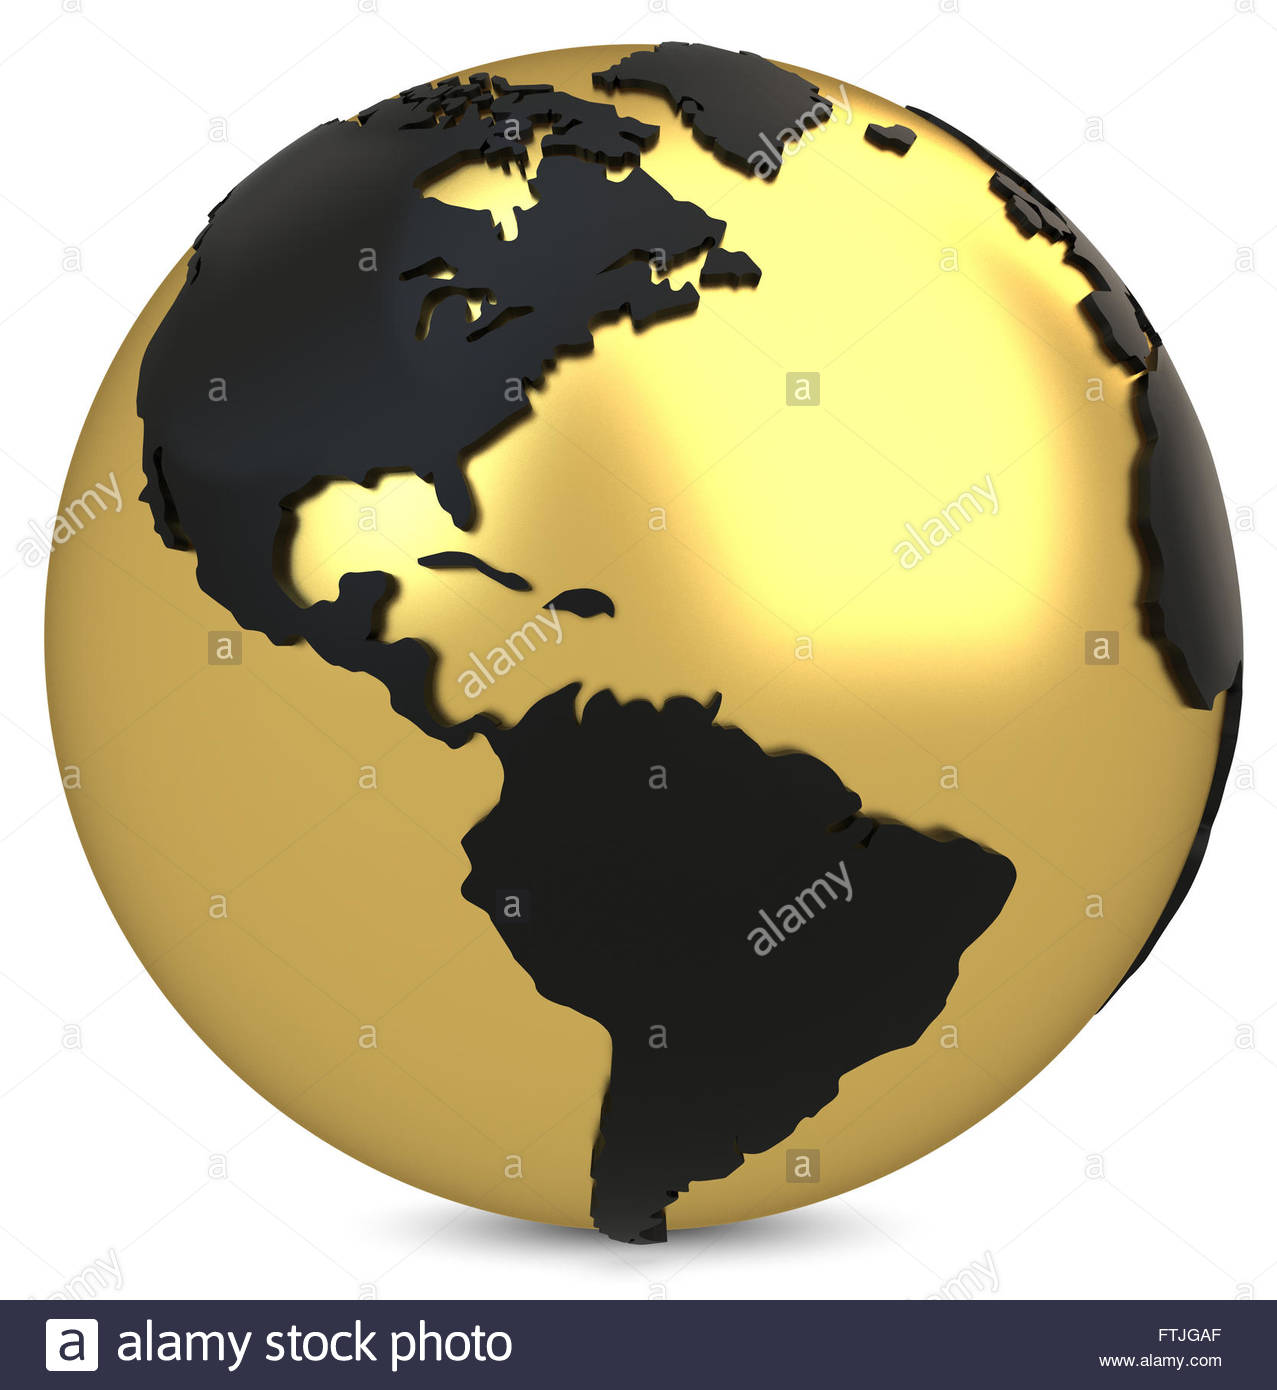 3d golden earth globe on white background - Stock Image